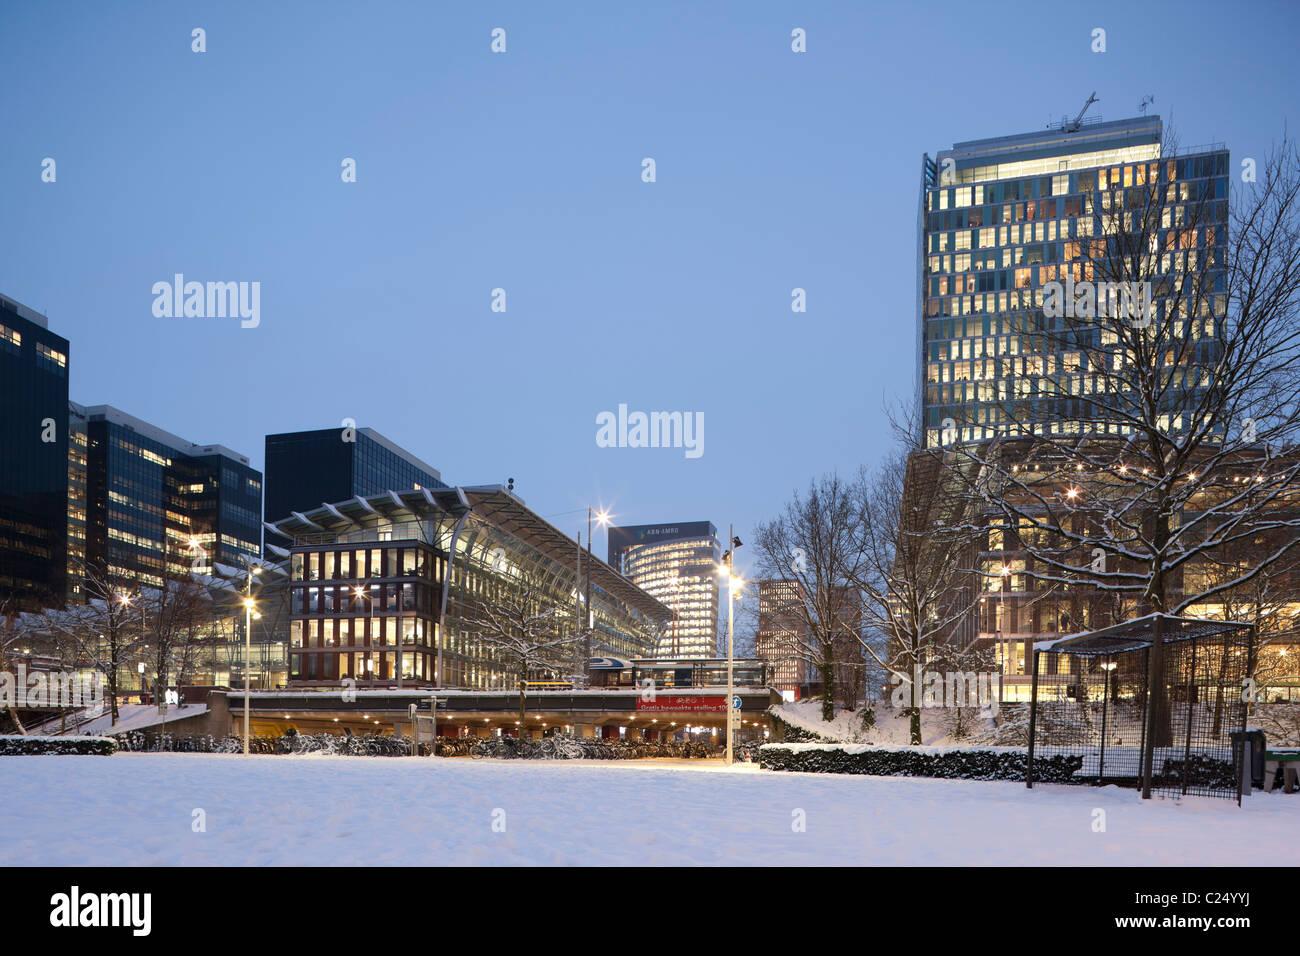 WTC World Trade Center Amsterdam on the Zuidas central business district cbd in winter snow. Nauta AbnAmro ABN-Amro - Stock Image